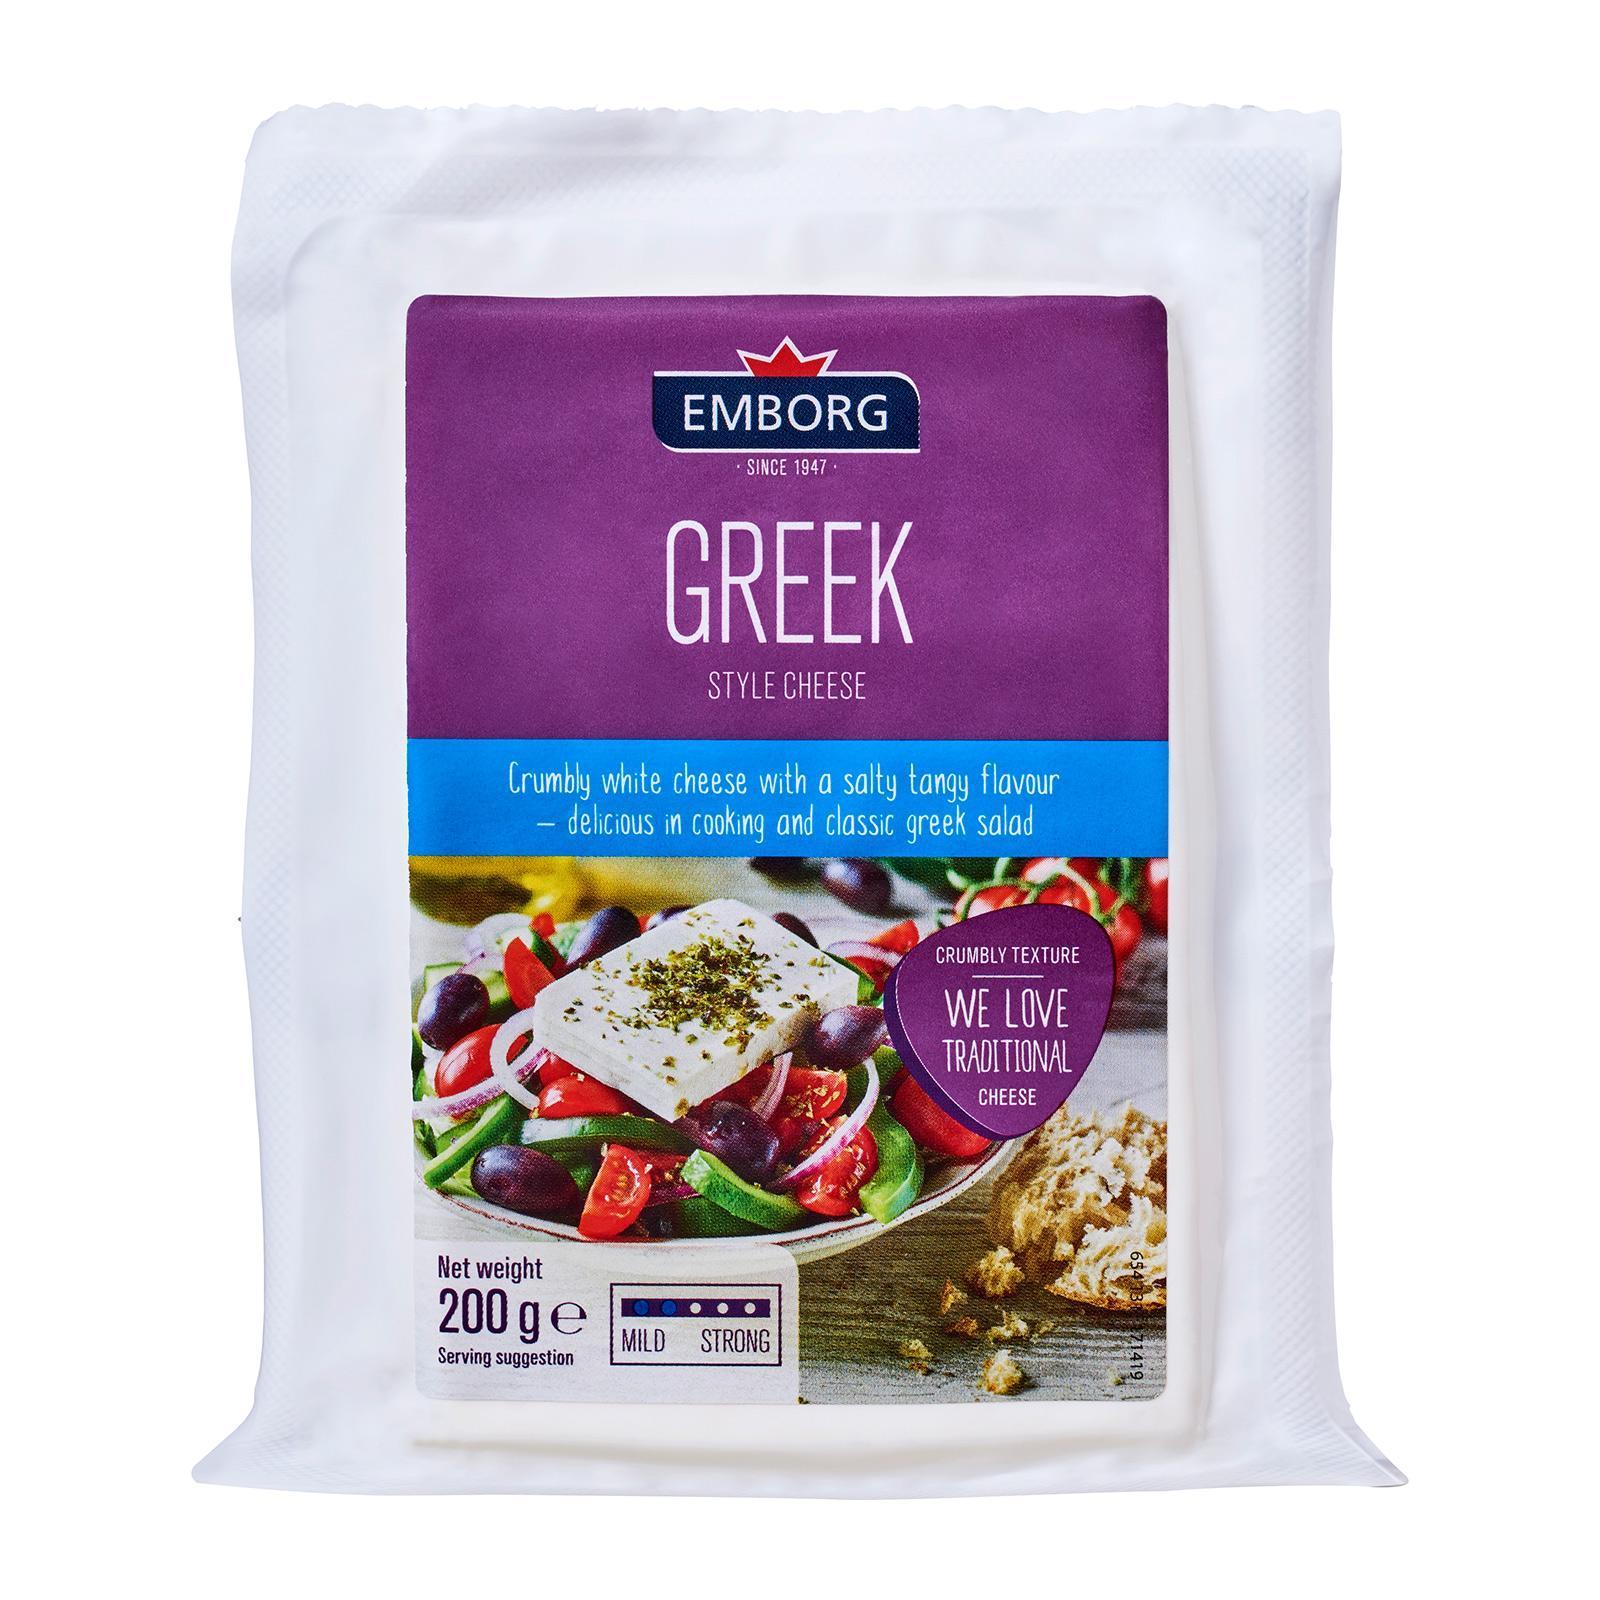 Emborg Greek Style Cheese By Redmart.